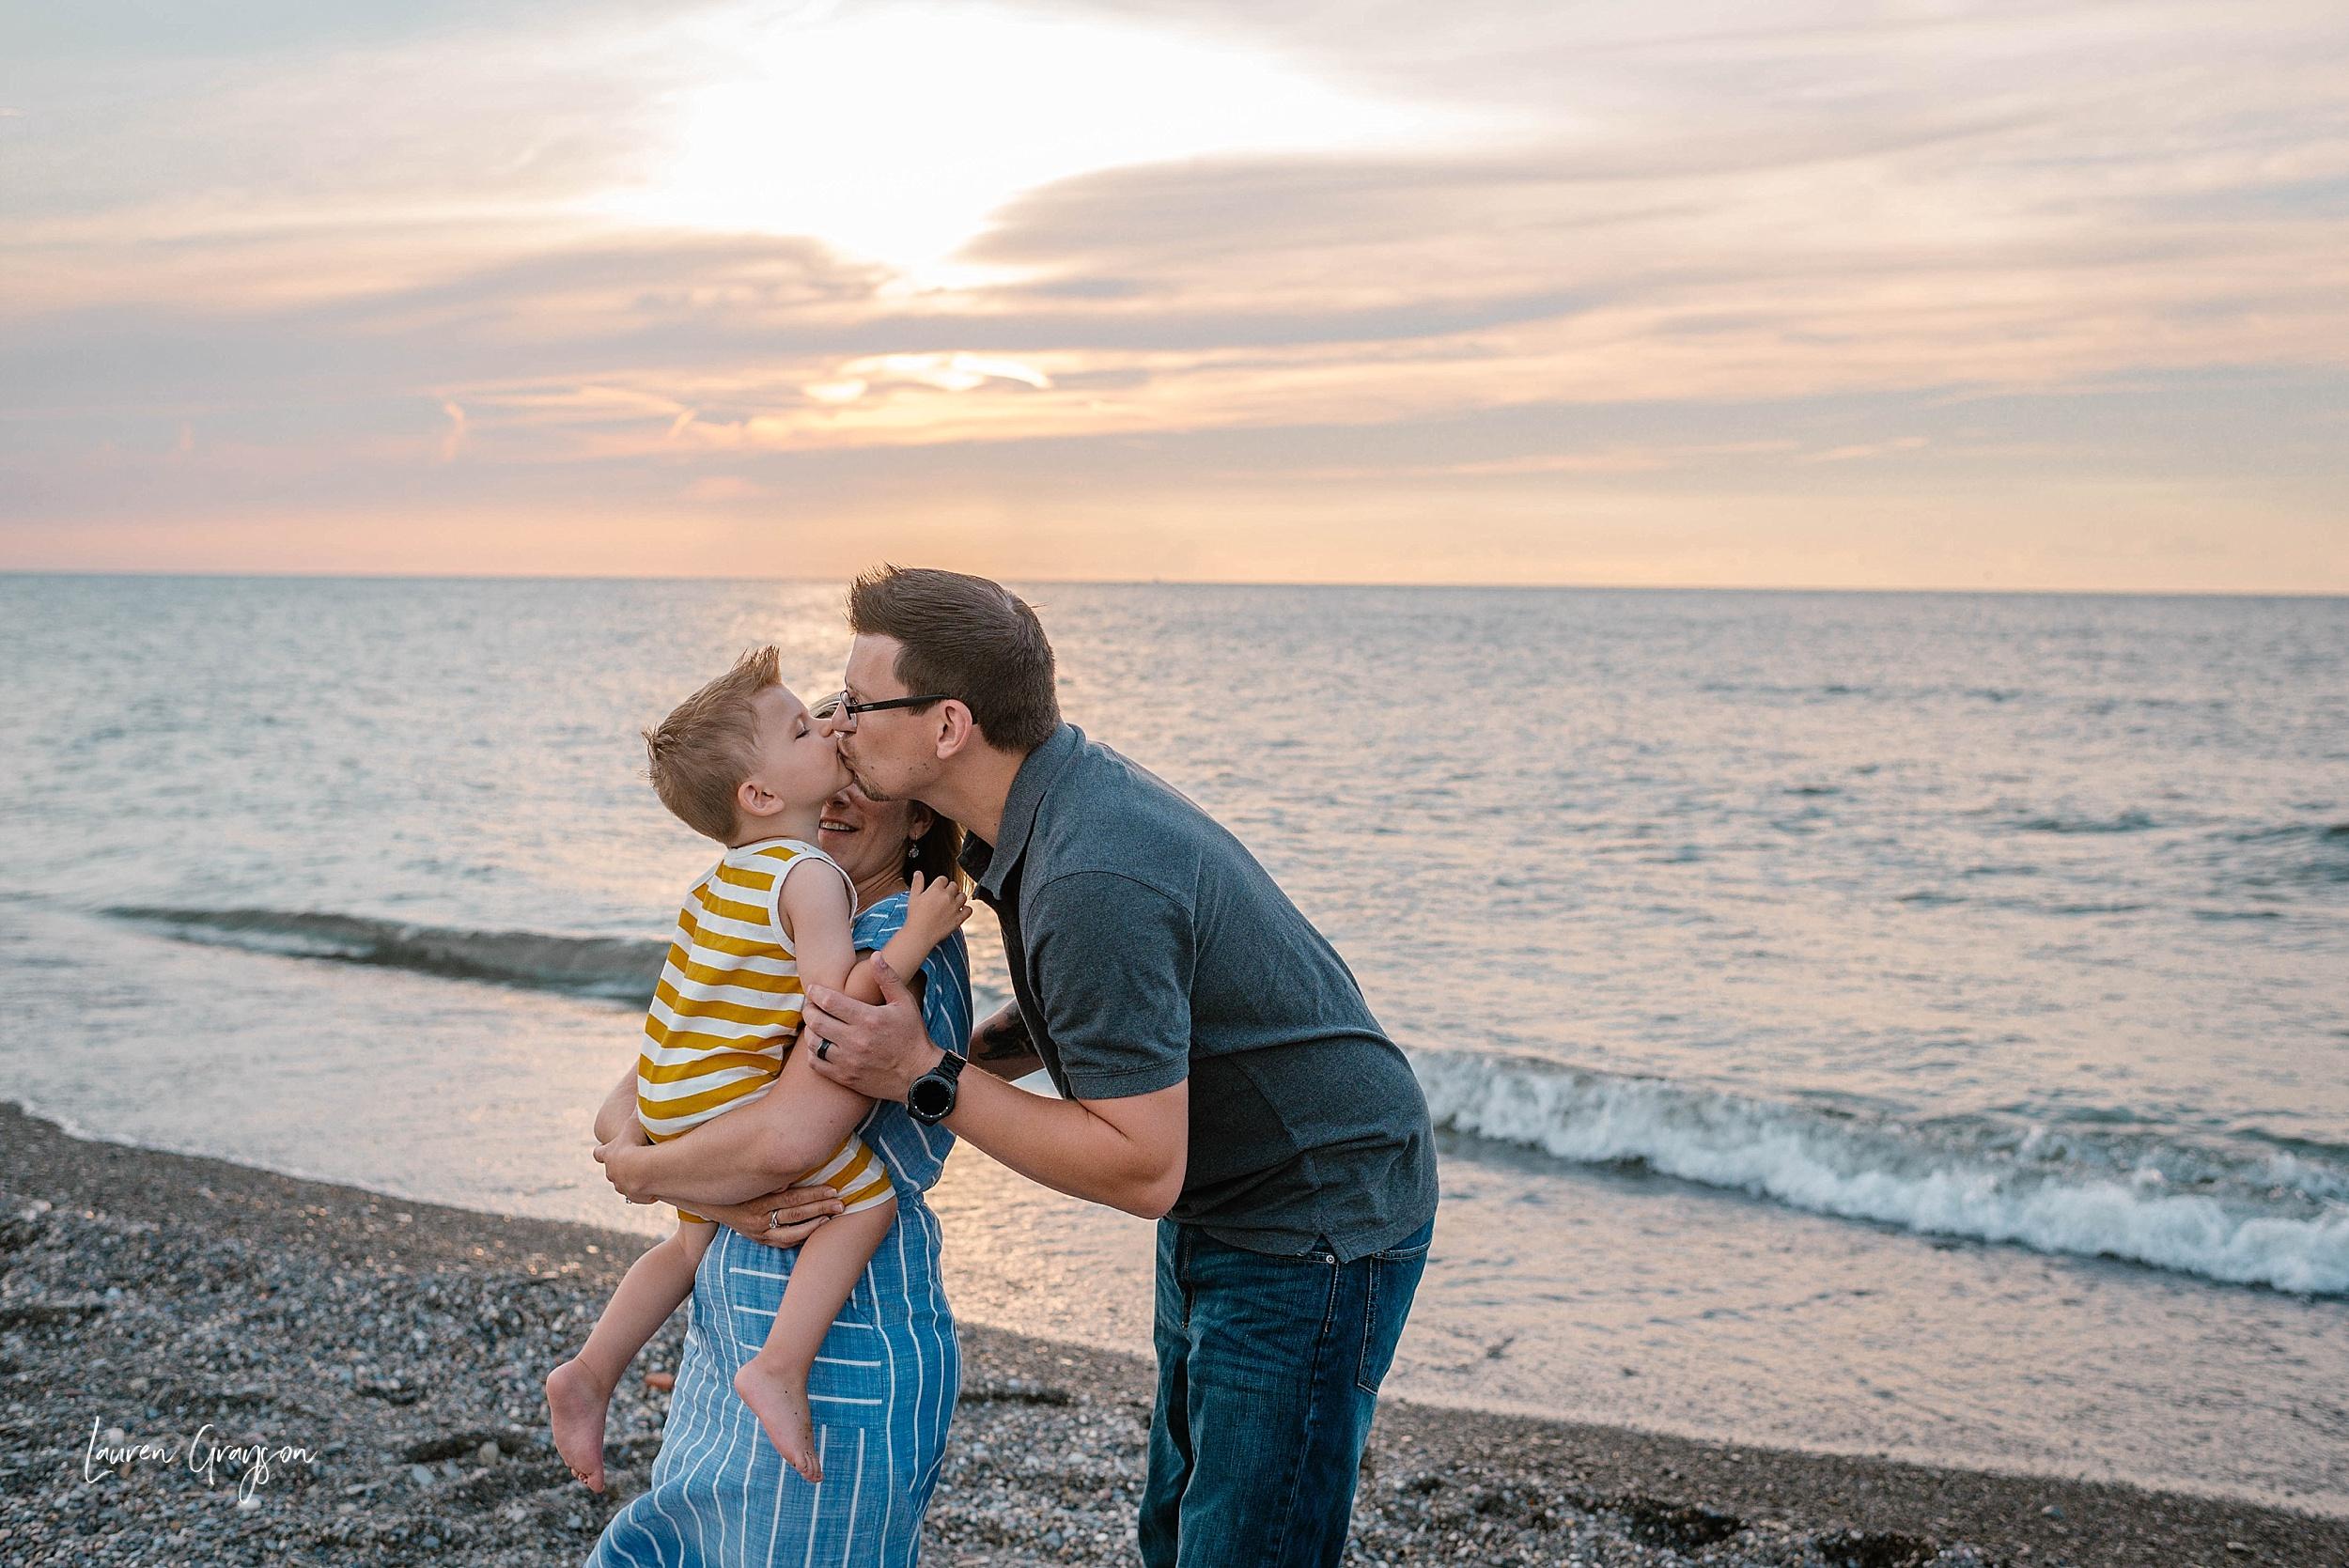 lauren-grayson-photography-cleveland-ohio-photographer-mentor-headlands-beach-maternity-session-2018_0771.jpg